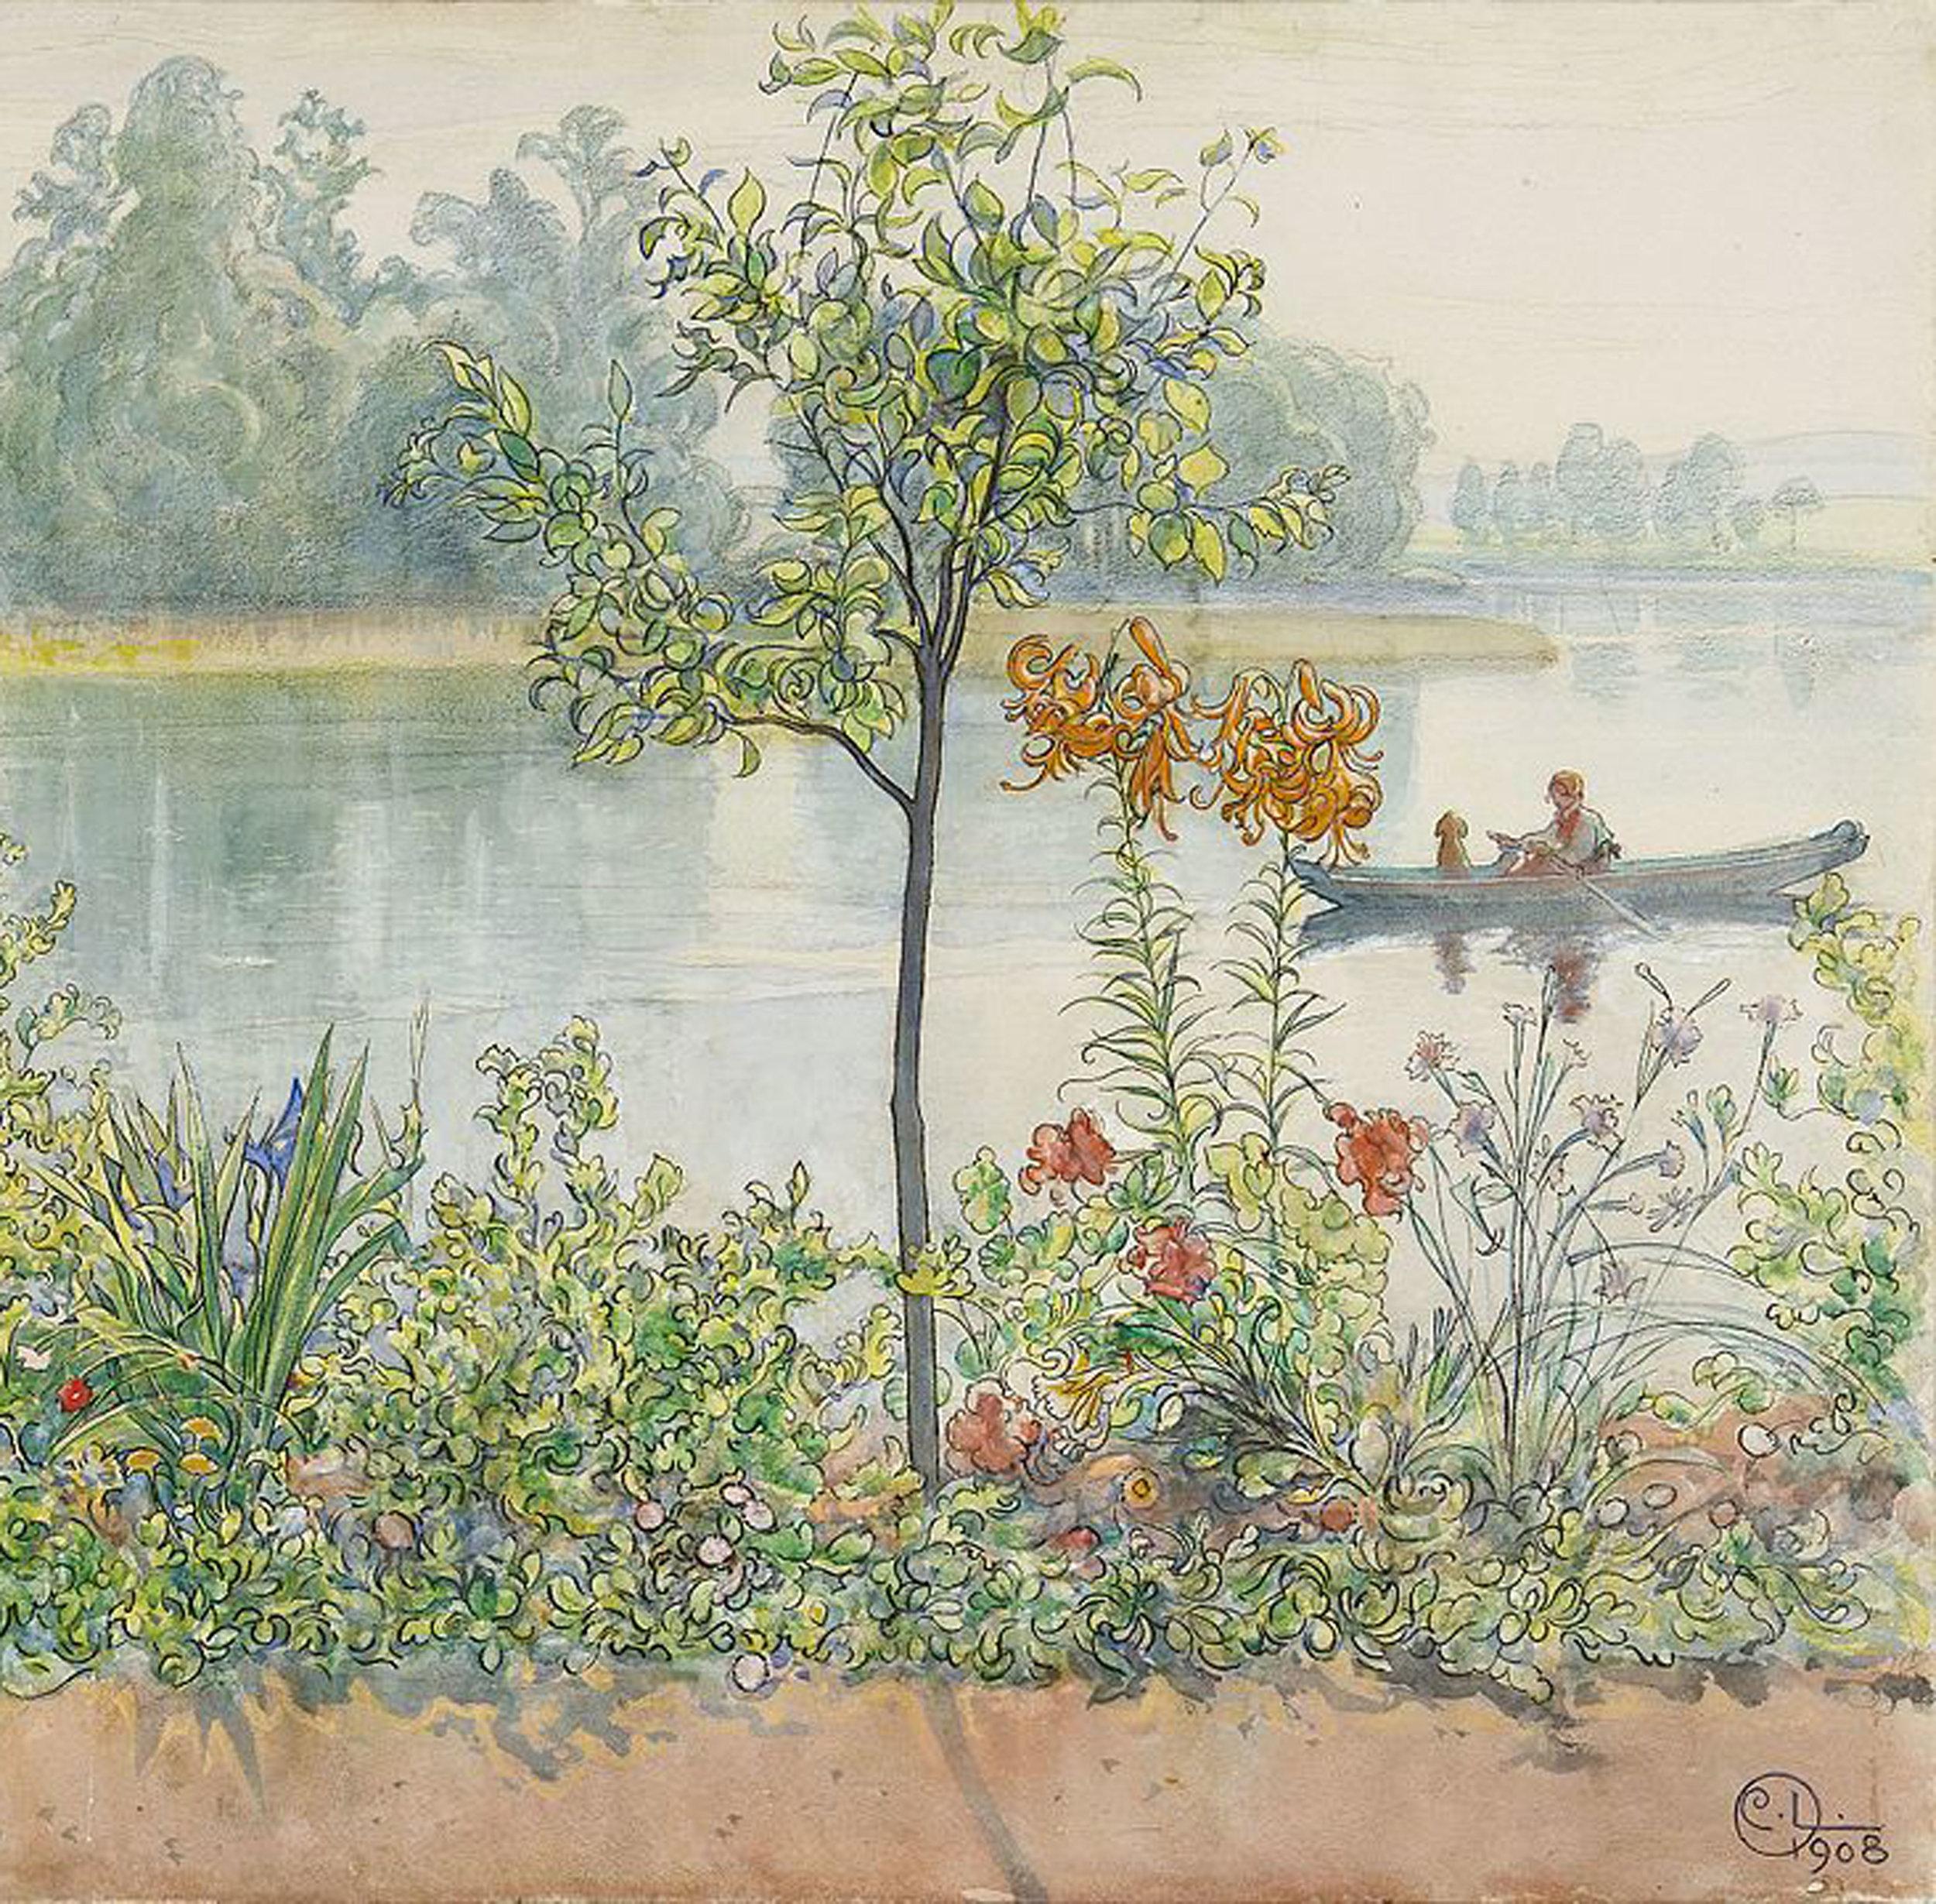 Carl Larsson   Karin by the Shore 1908.jpeg